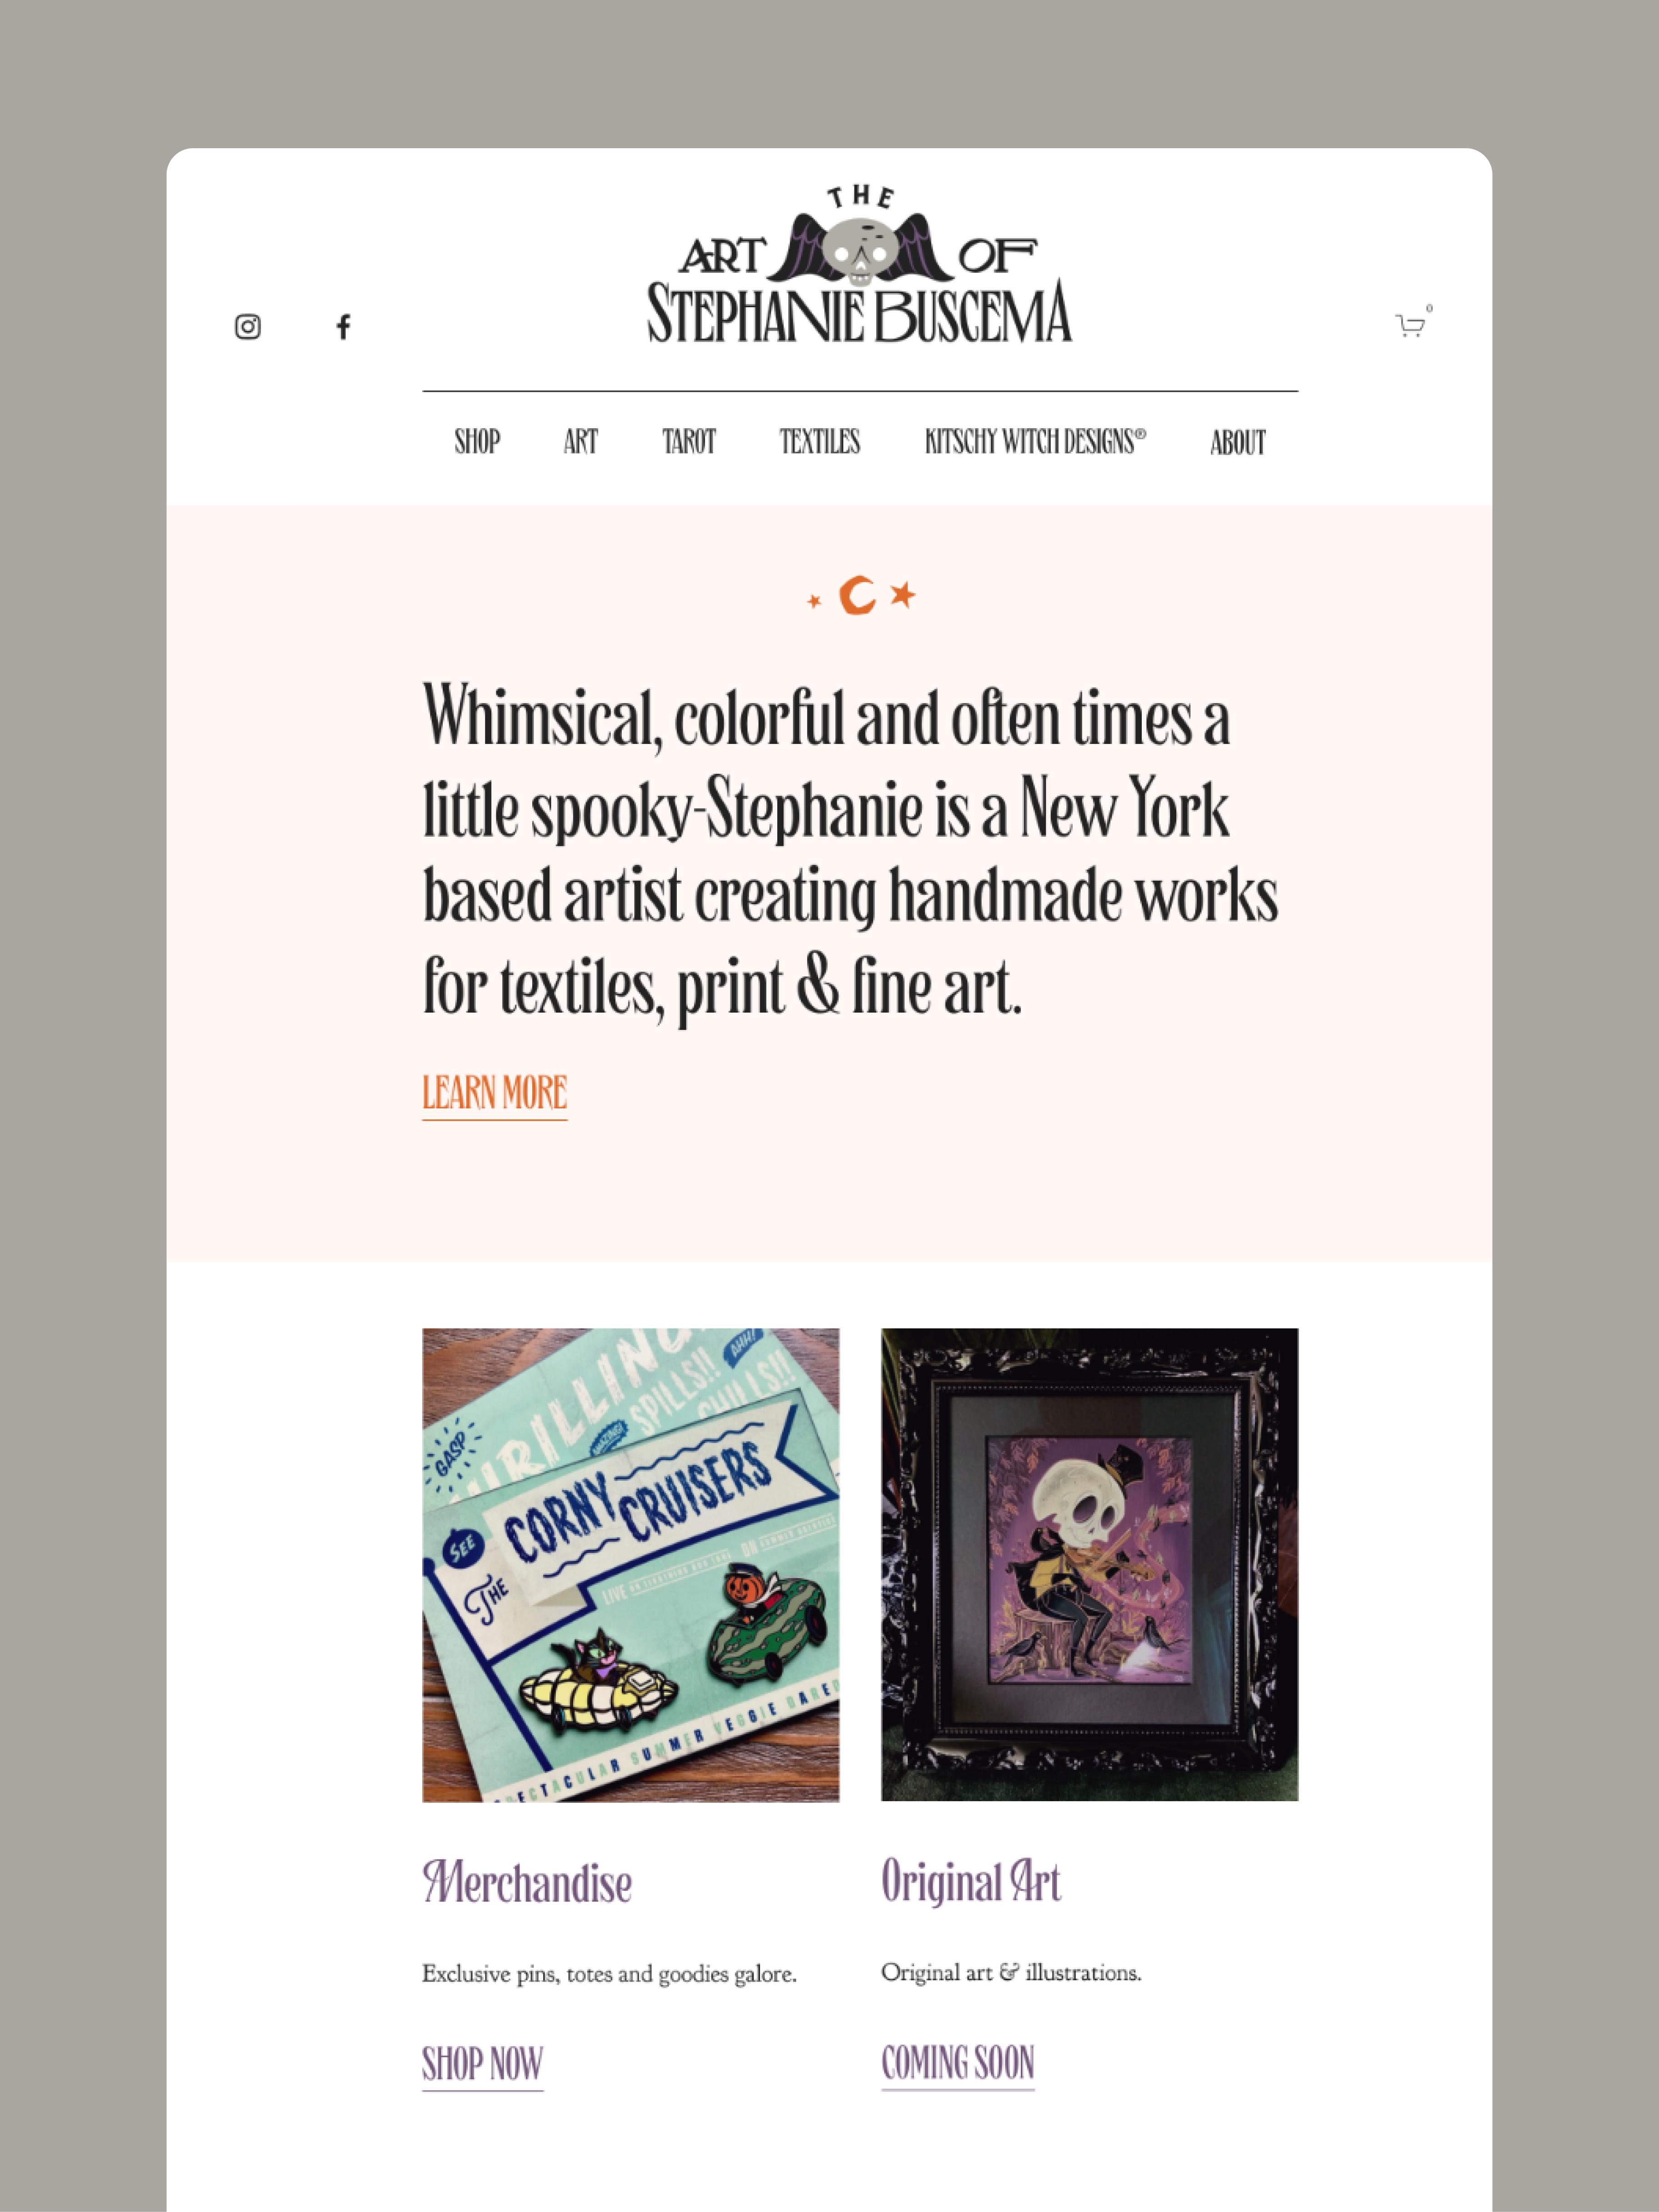 Homepage design — The Art of Stephanie Buscema